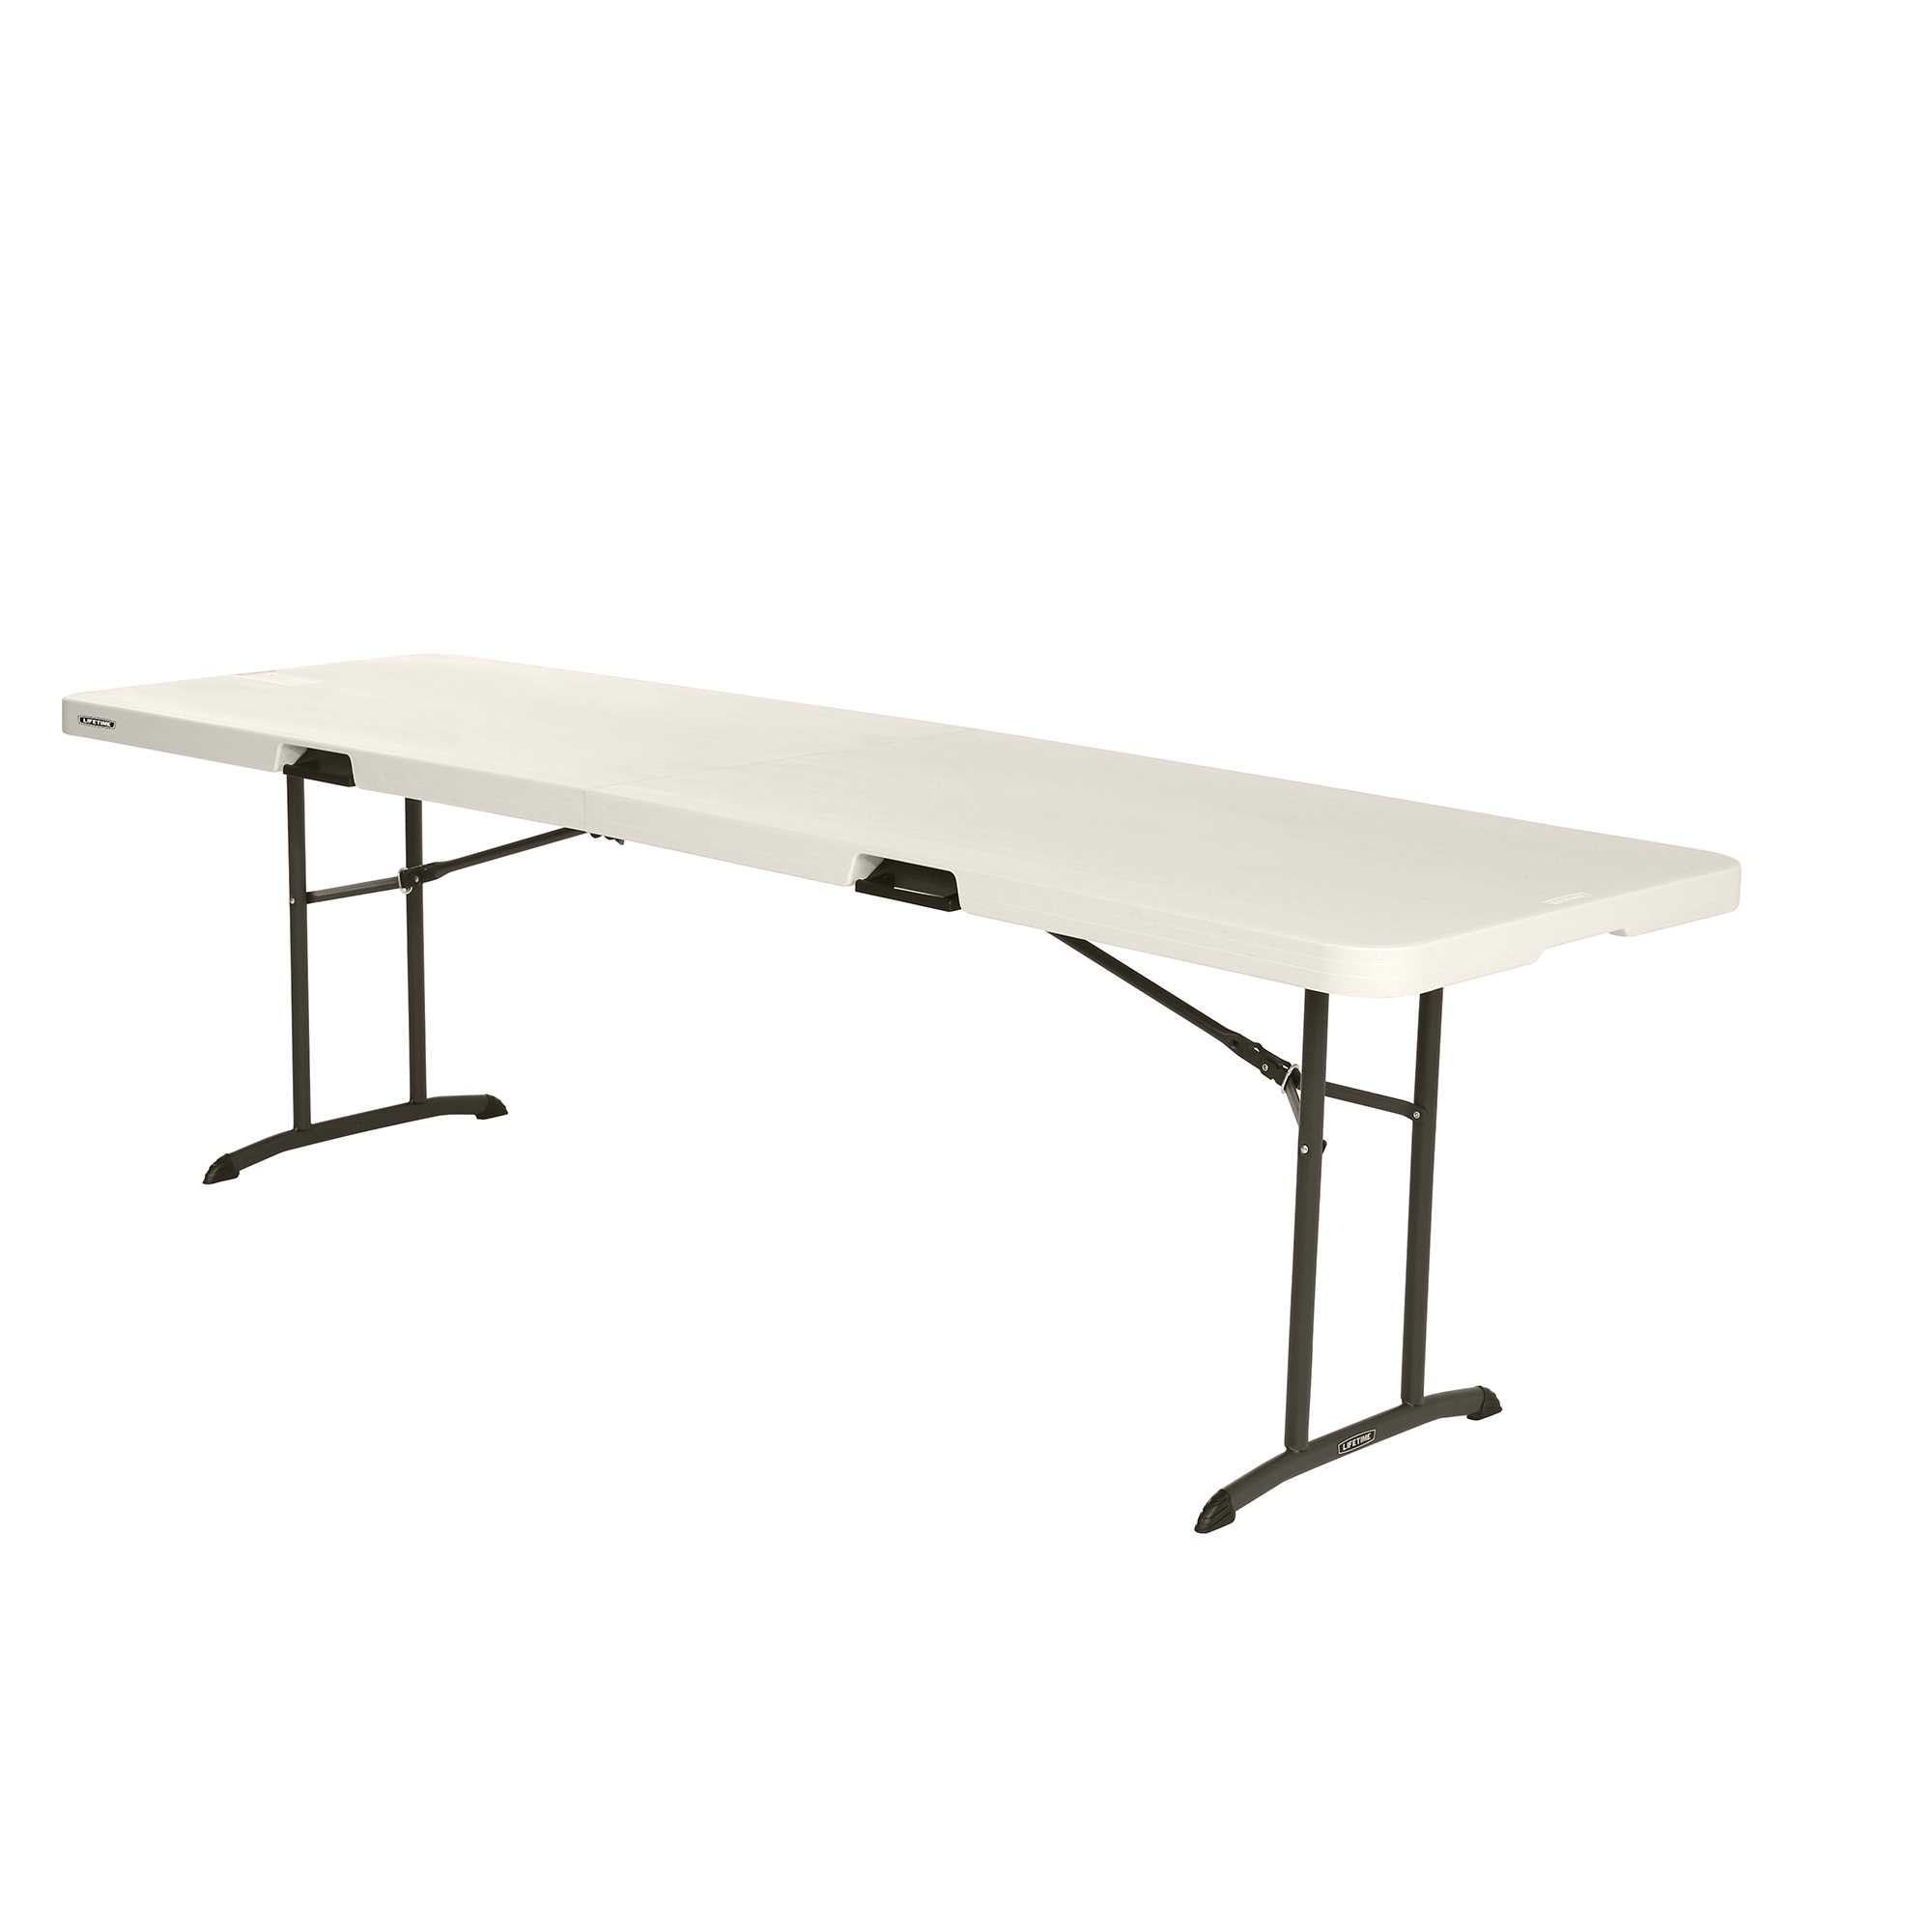 - Lifetime 8' Fold-In-Half Table, Almond, 80175 - Walmart.com